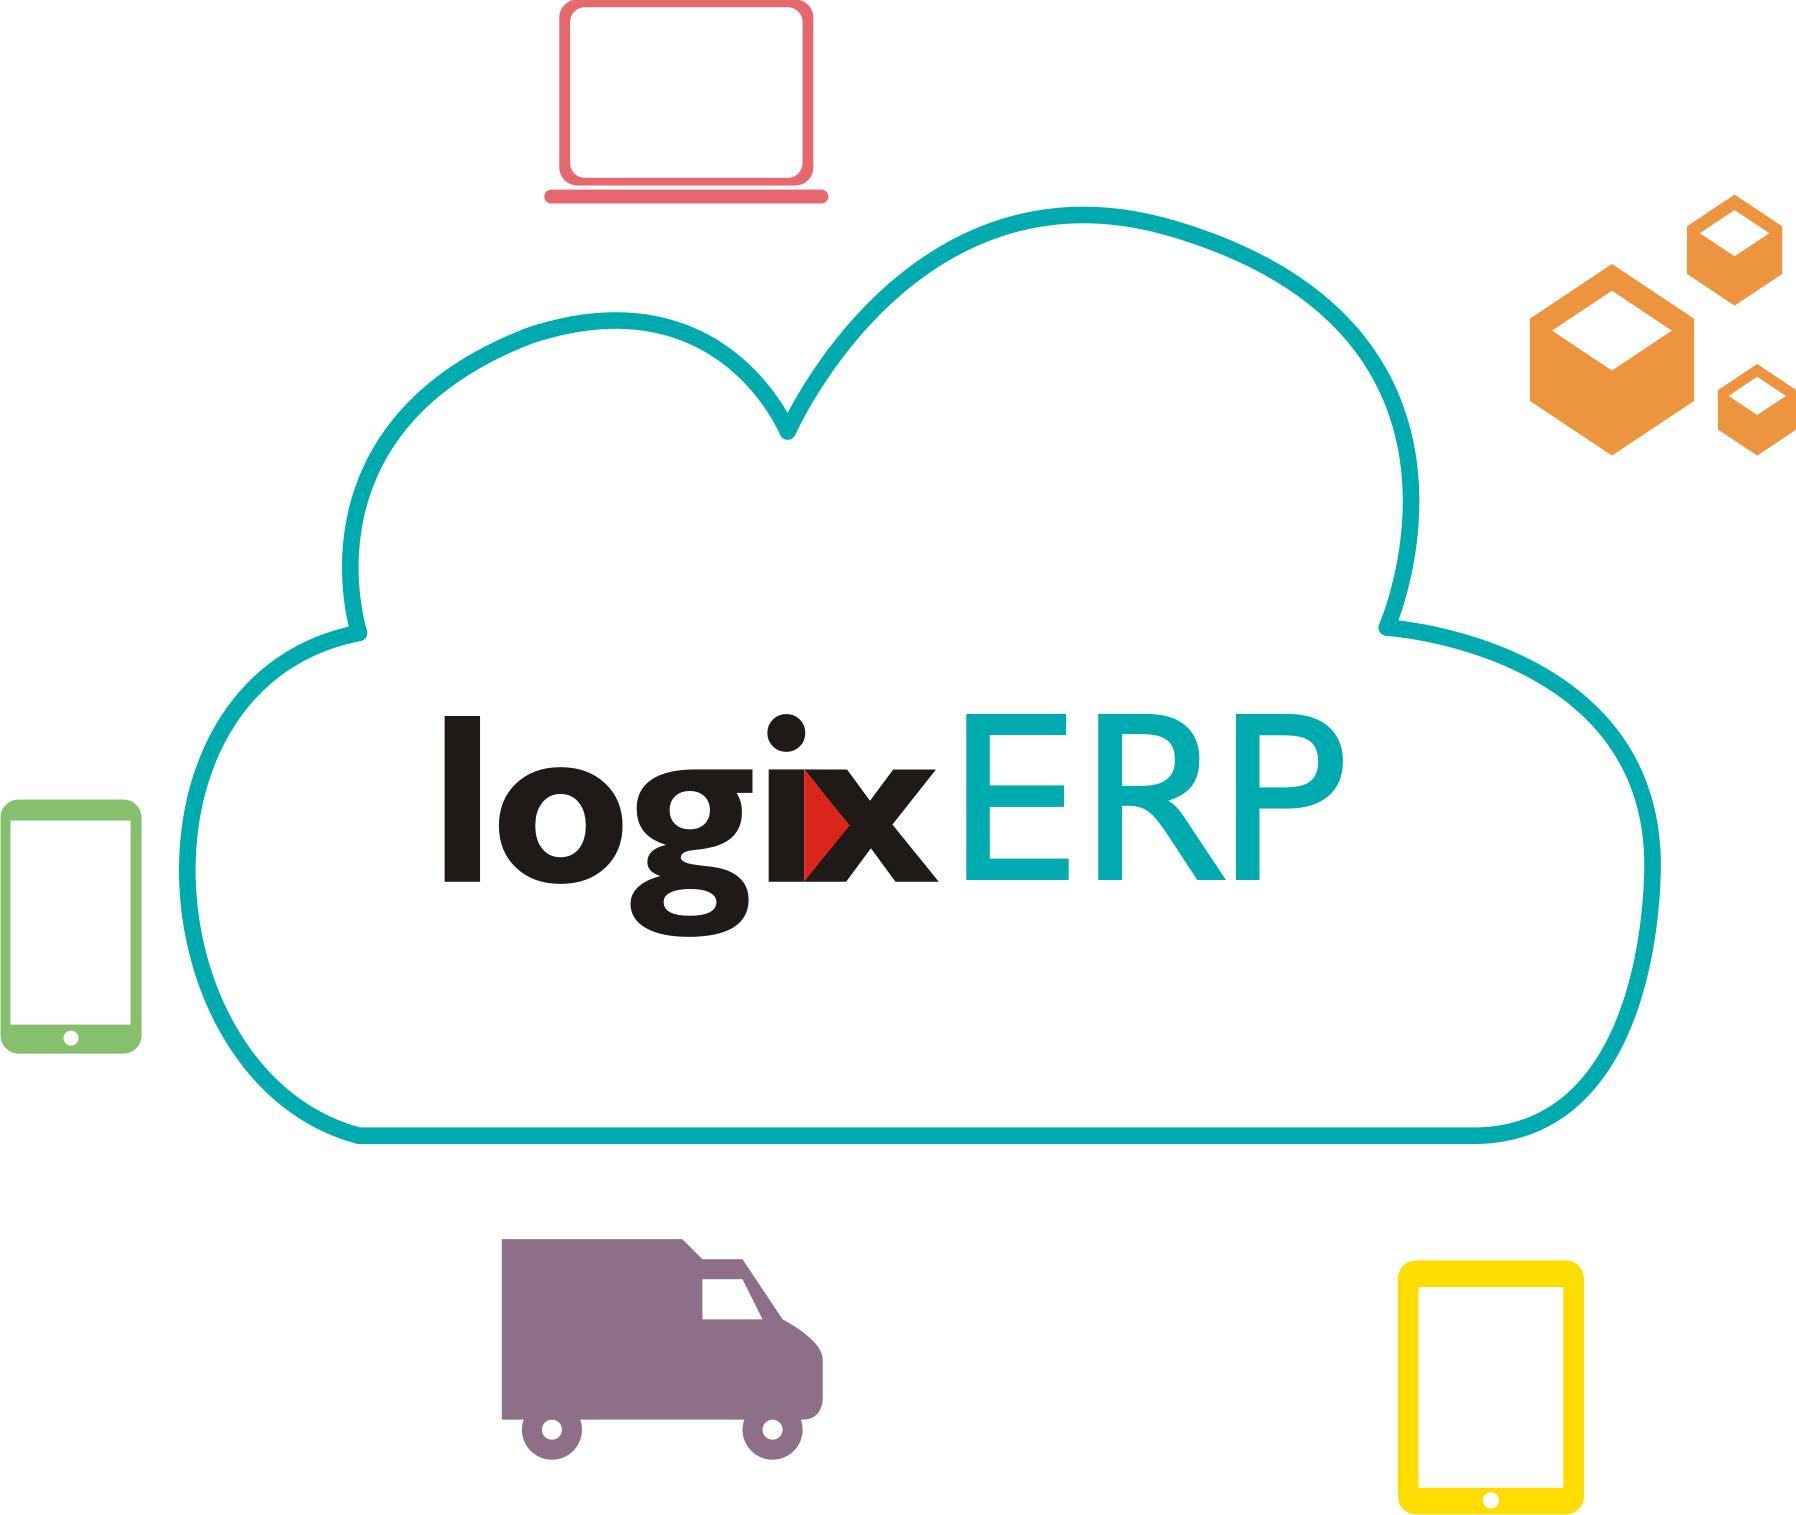 Logixgrid platform and application. Fast clipart courier boy